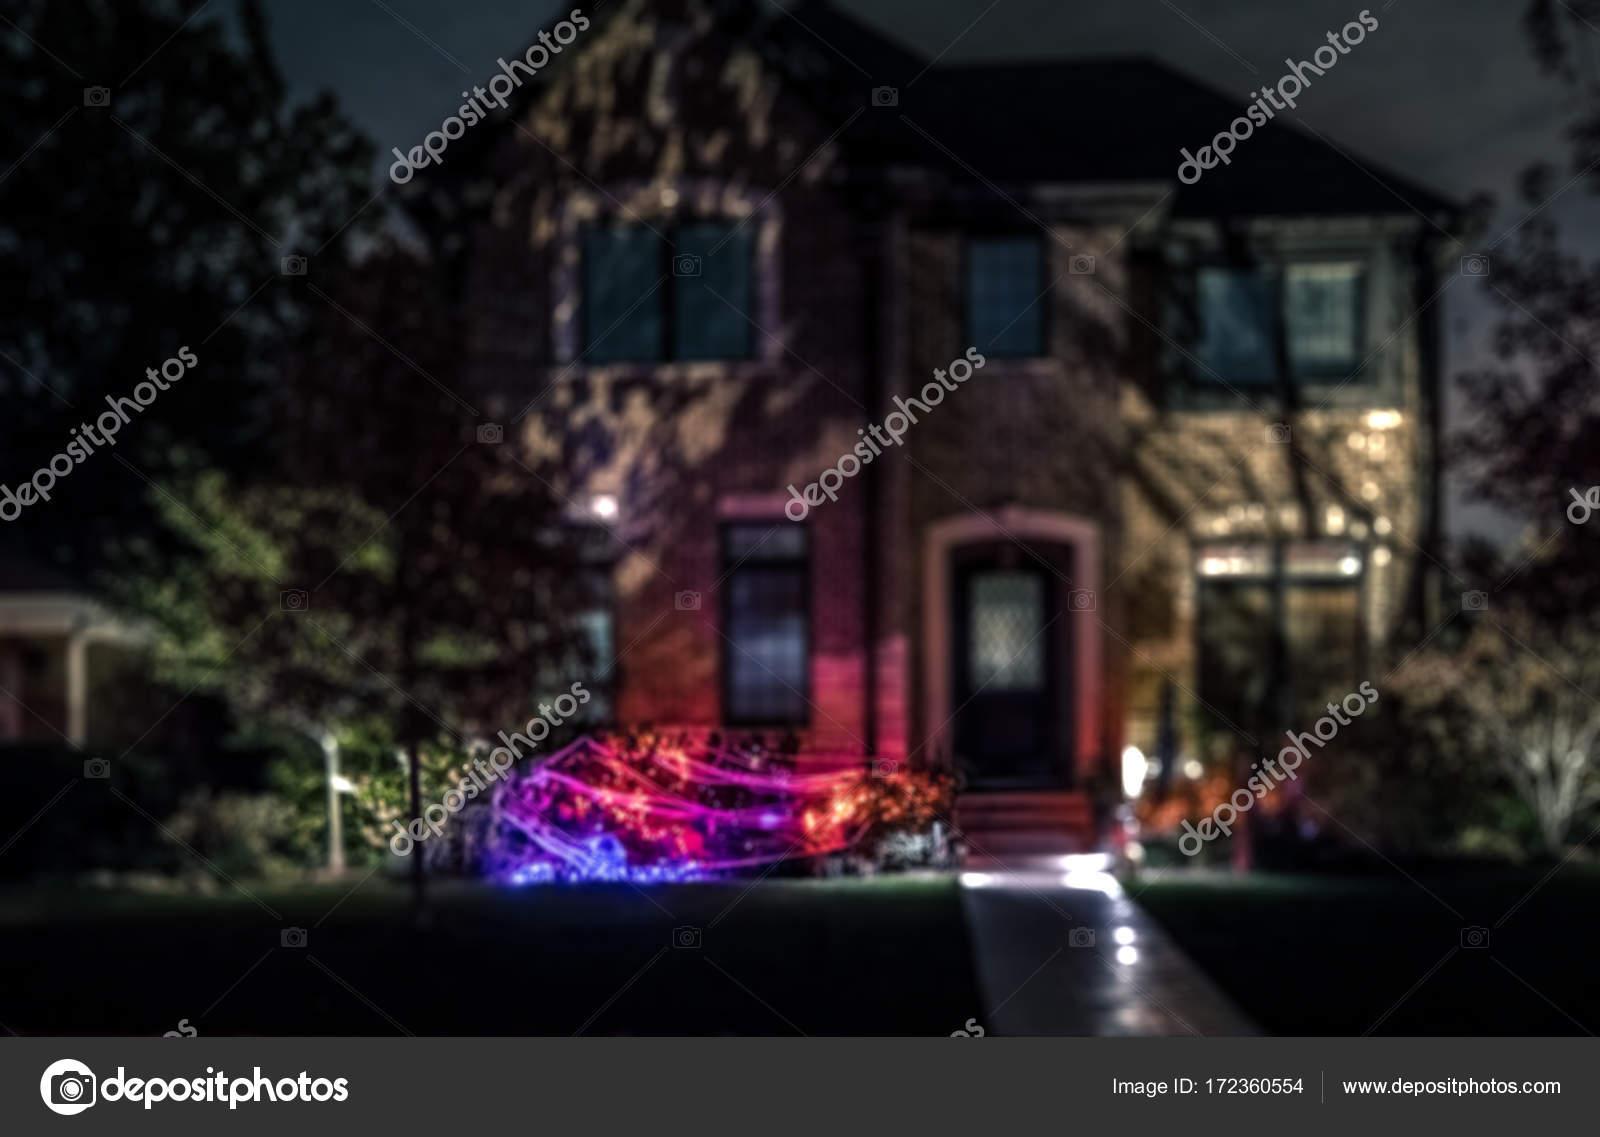 Halloween Verlichting.Halloween Huis Verlichting Stockfoto C Marchello74 172360554